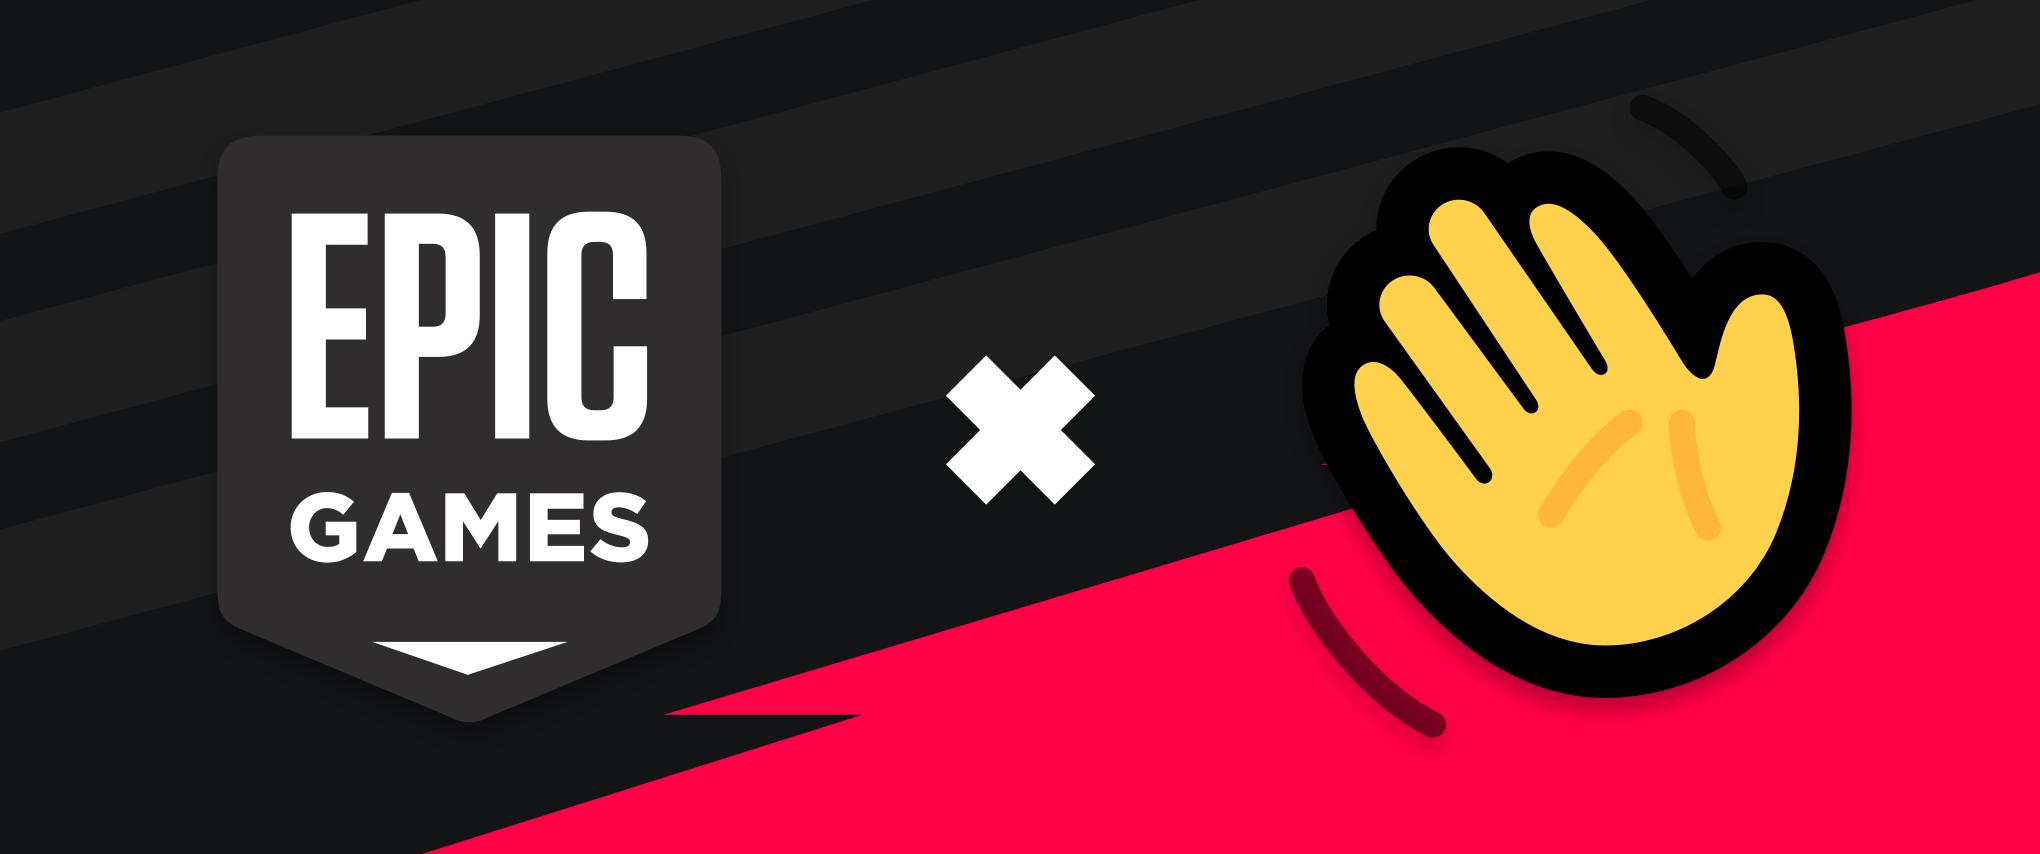 Fortnite Maker Epic Acquires Social Video App Houseparty Techcrunch